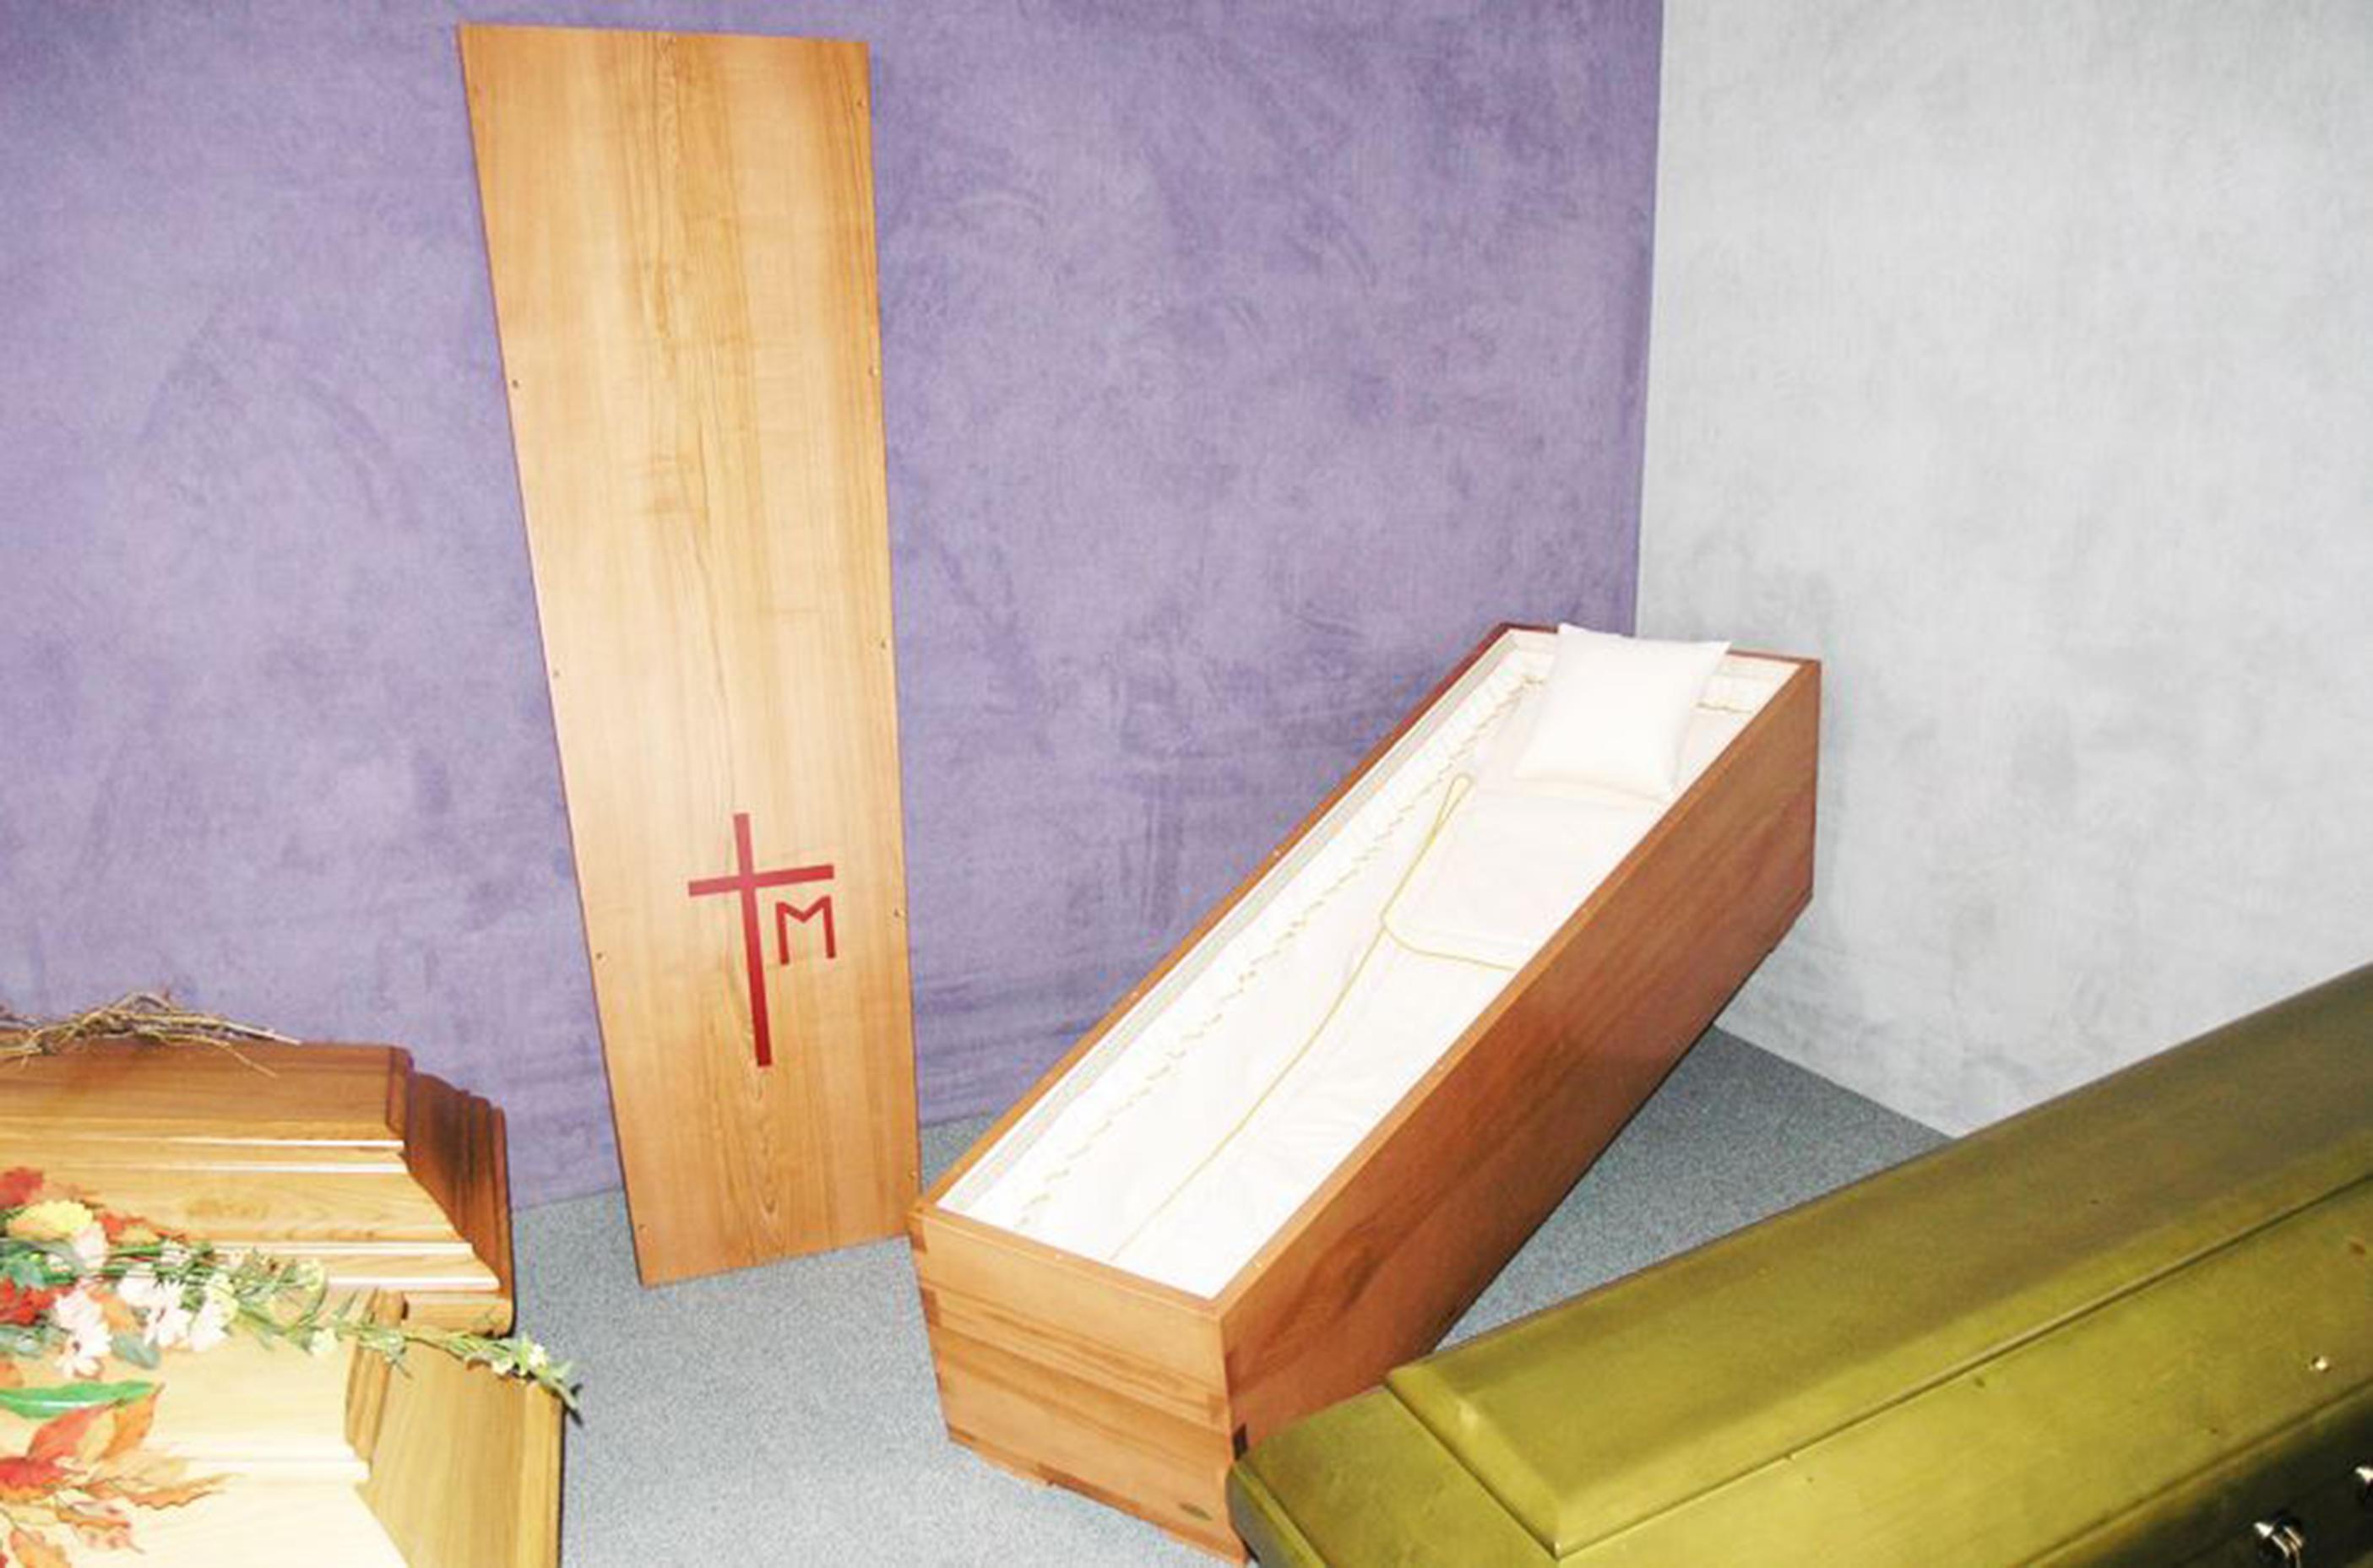 Conrad Konert Bestattungen